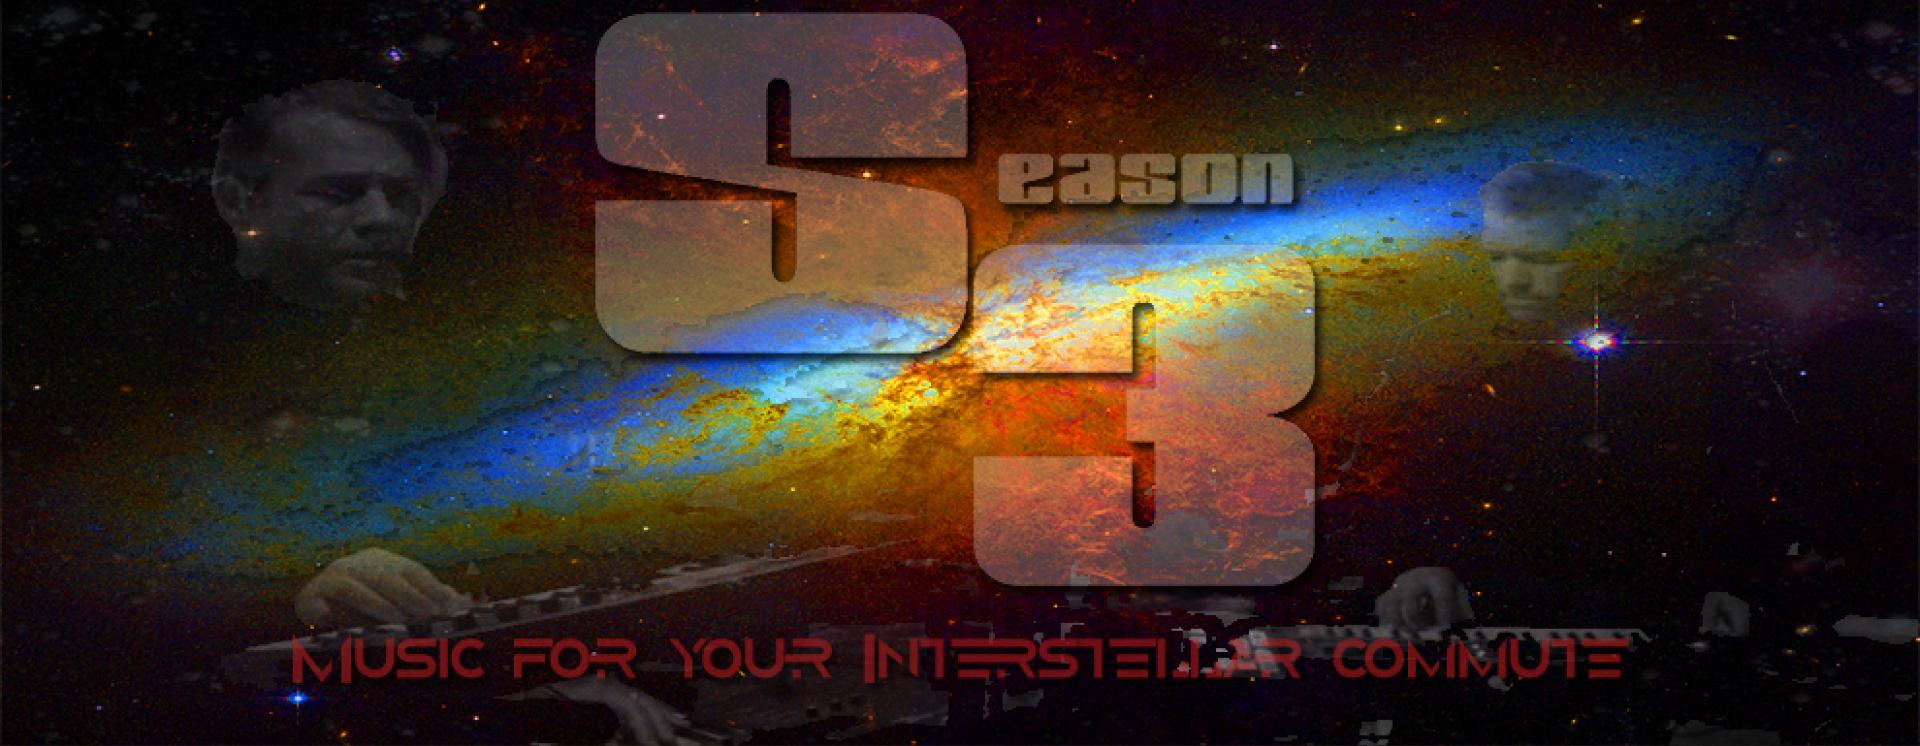 1421328736 season 3 banner copy